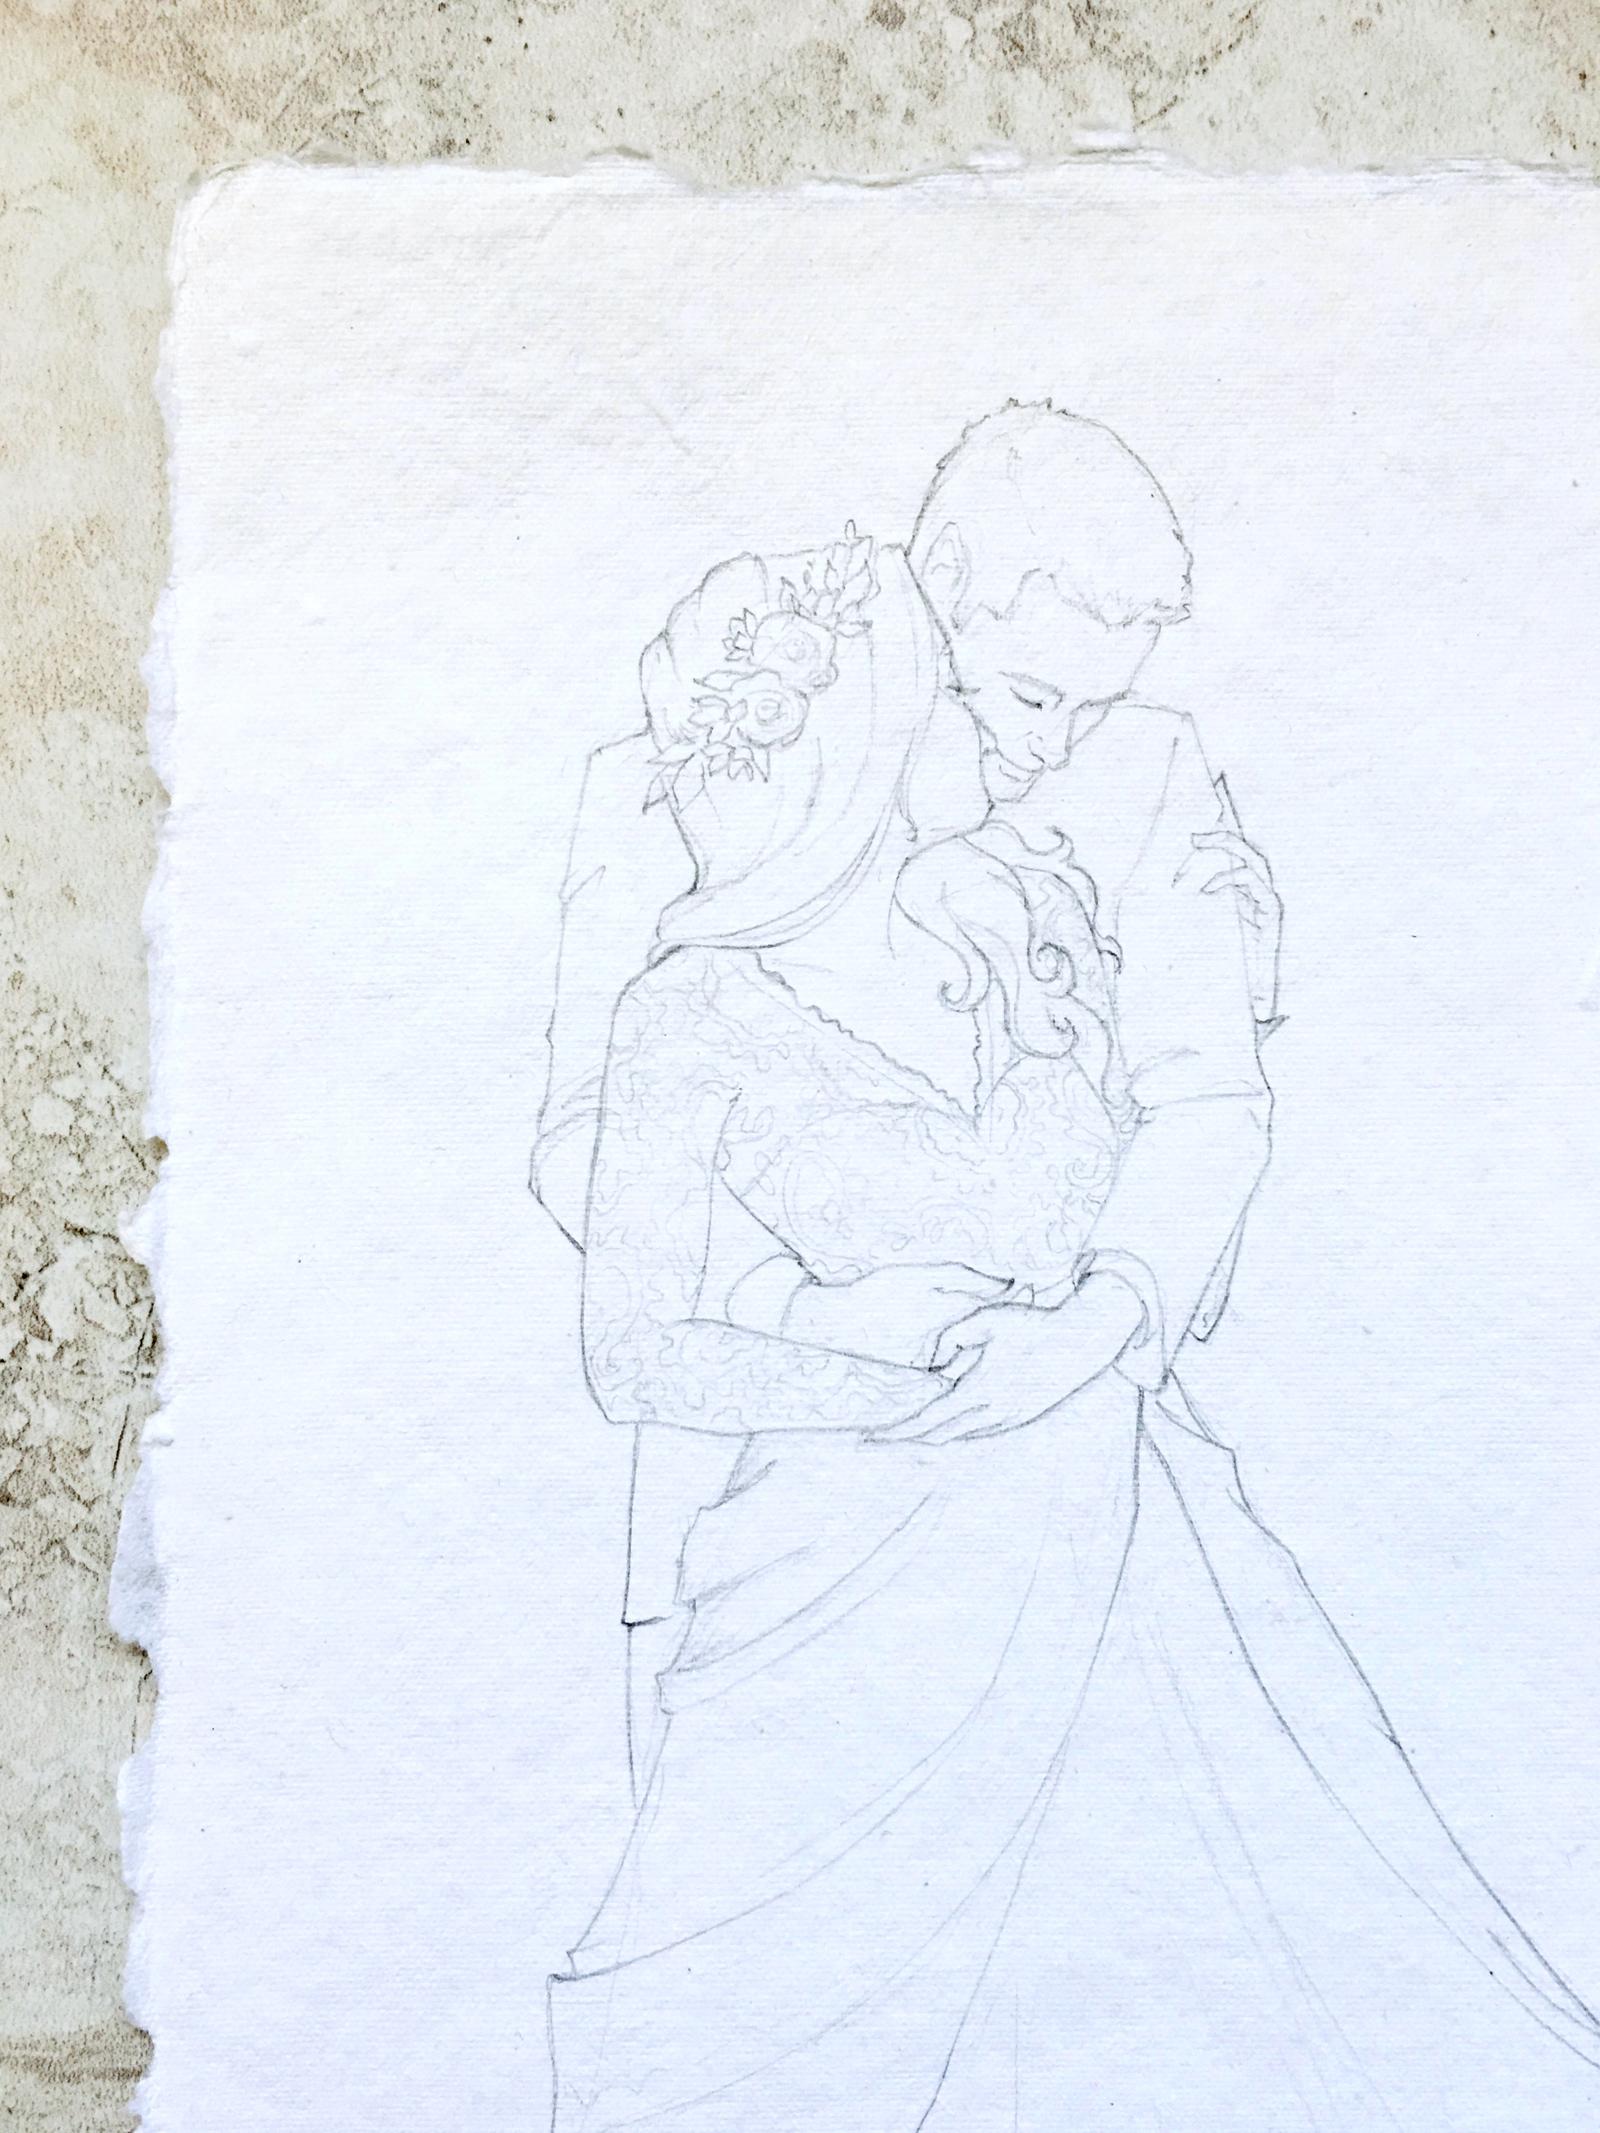 Custom bridal portrait sketch. Fine art bridal portrait on handmade paper. #customportrait #portraitillustration #blusheddesign #portraitsketch